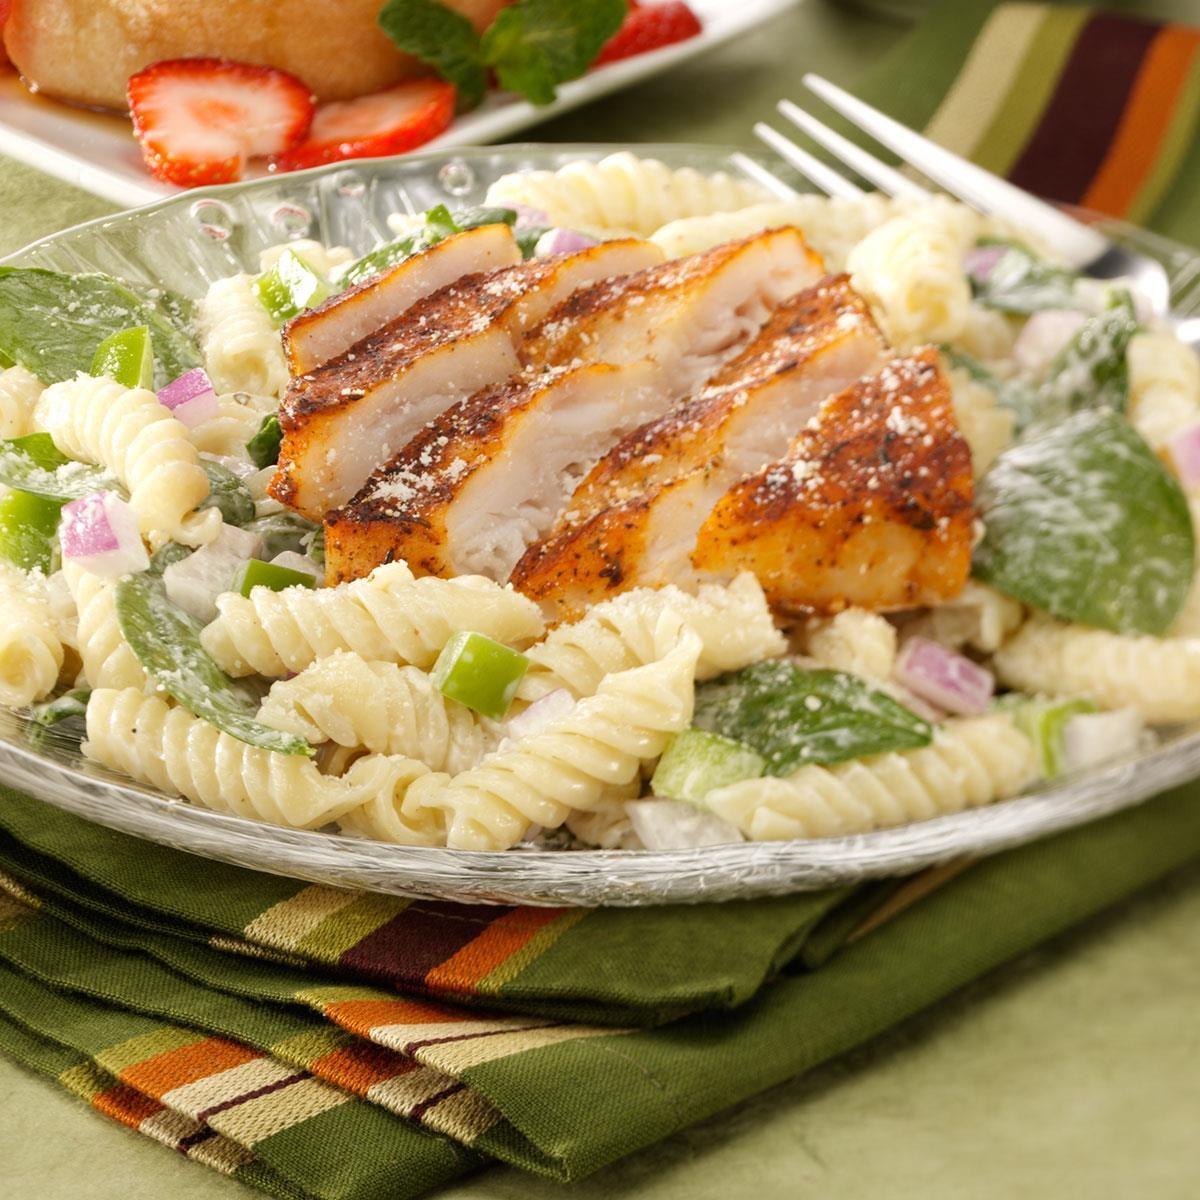 Blackened fish salad recipe taste of home for Fish salad recipes